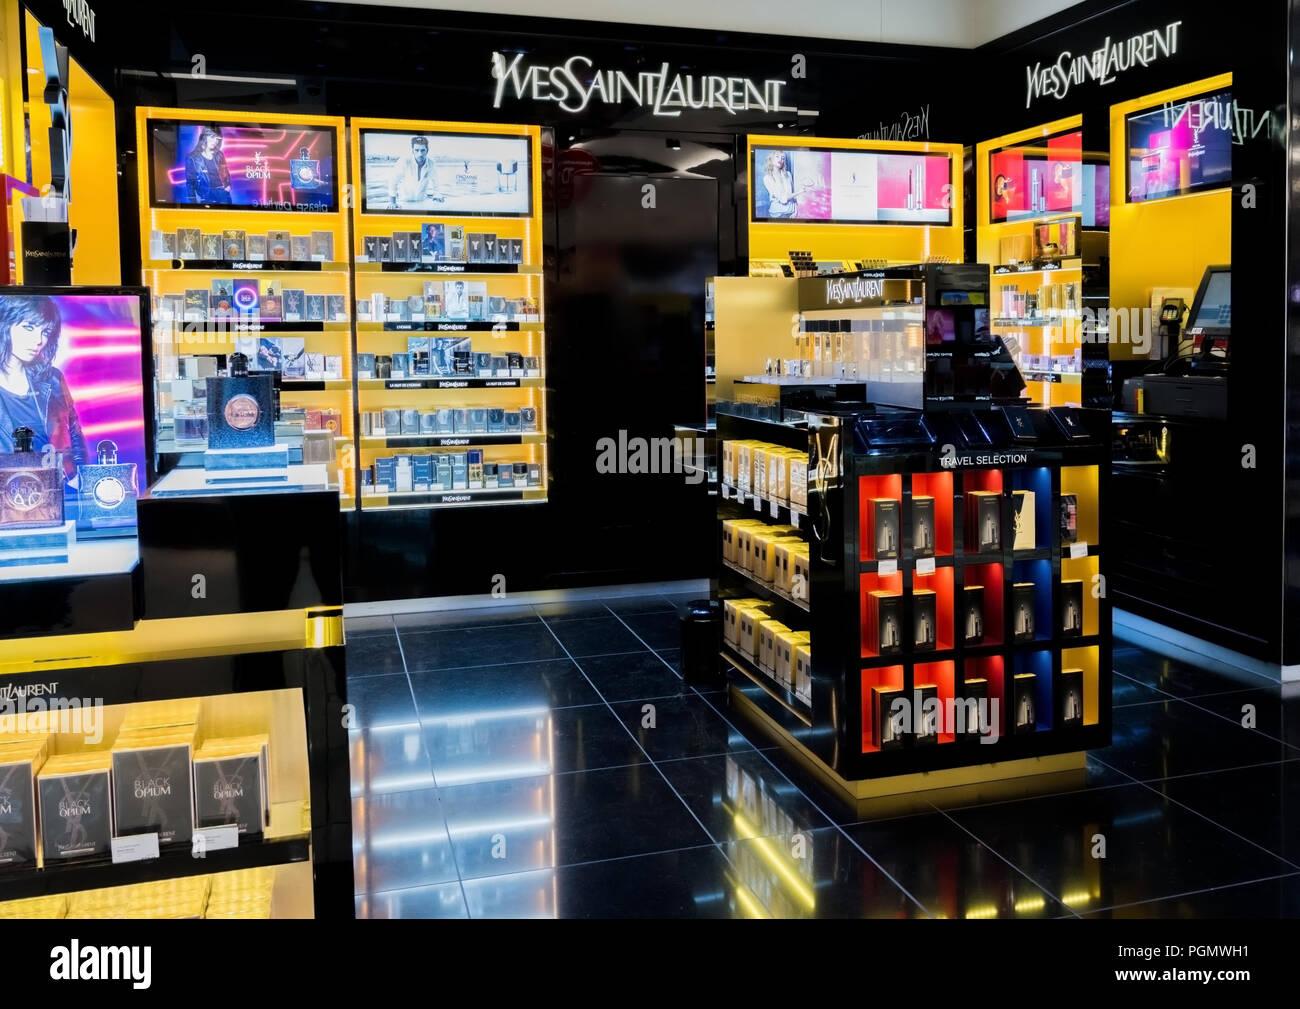 Saint Parfums Et Août 2018Yves Laurent Uni 31 LondresRoyaume rBWQxECoed